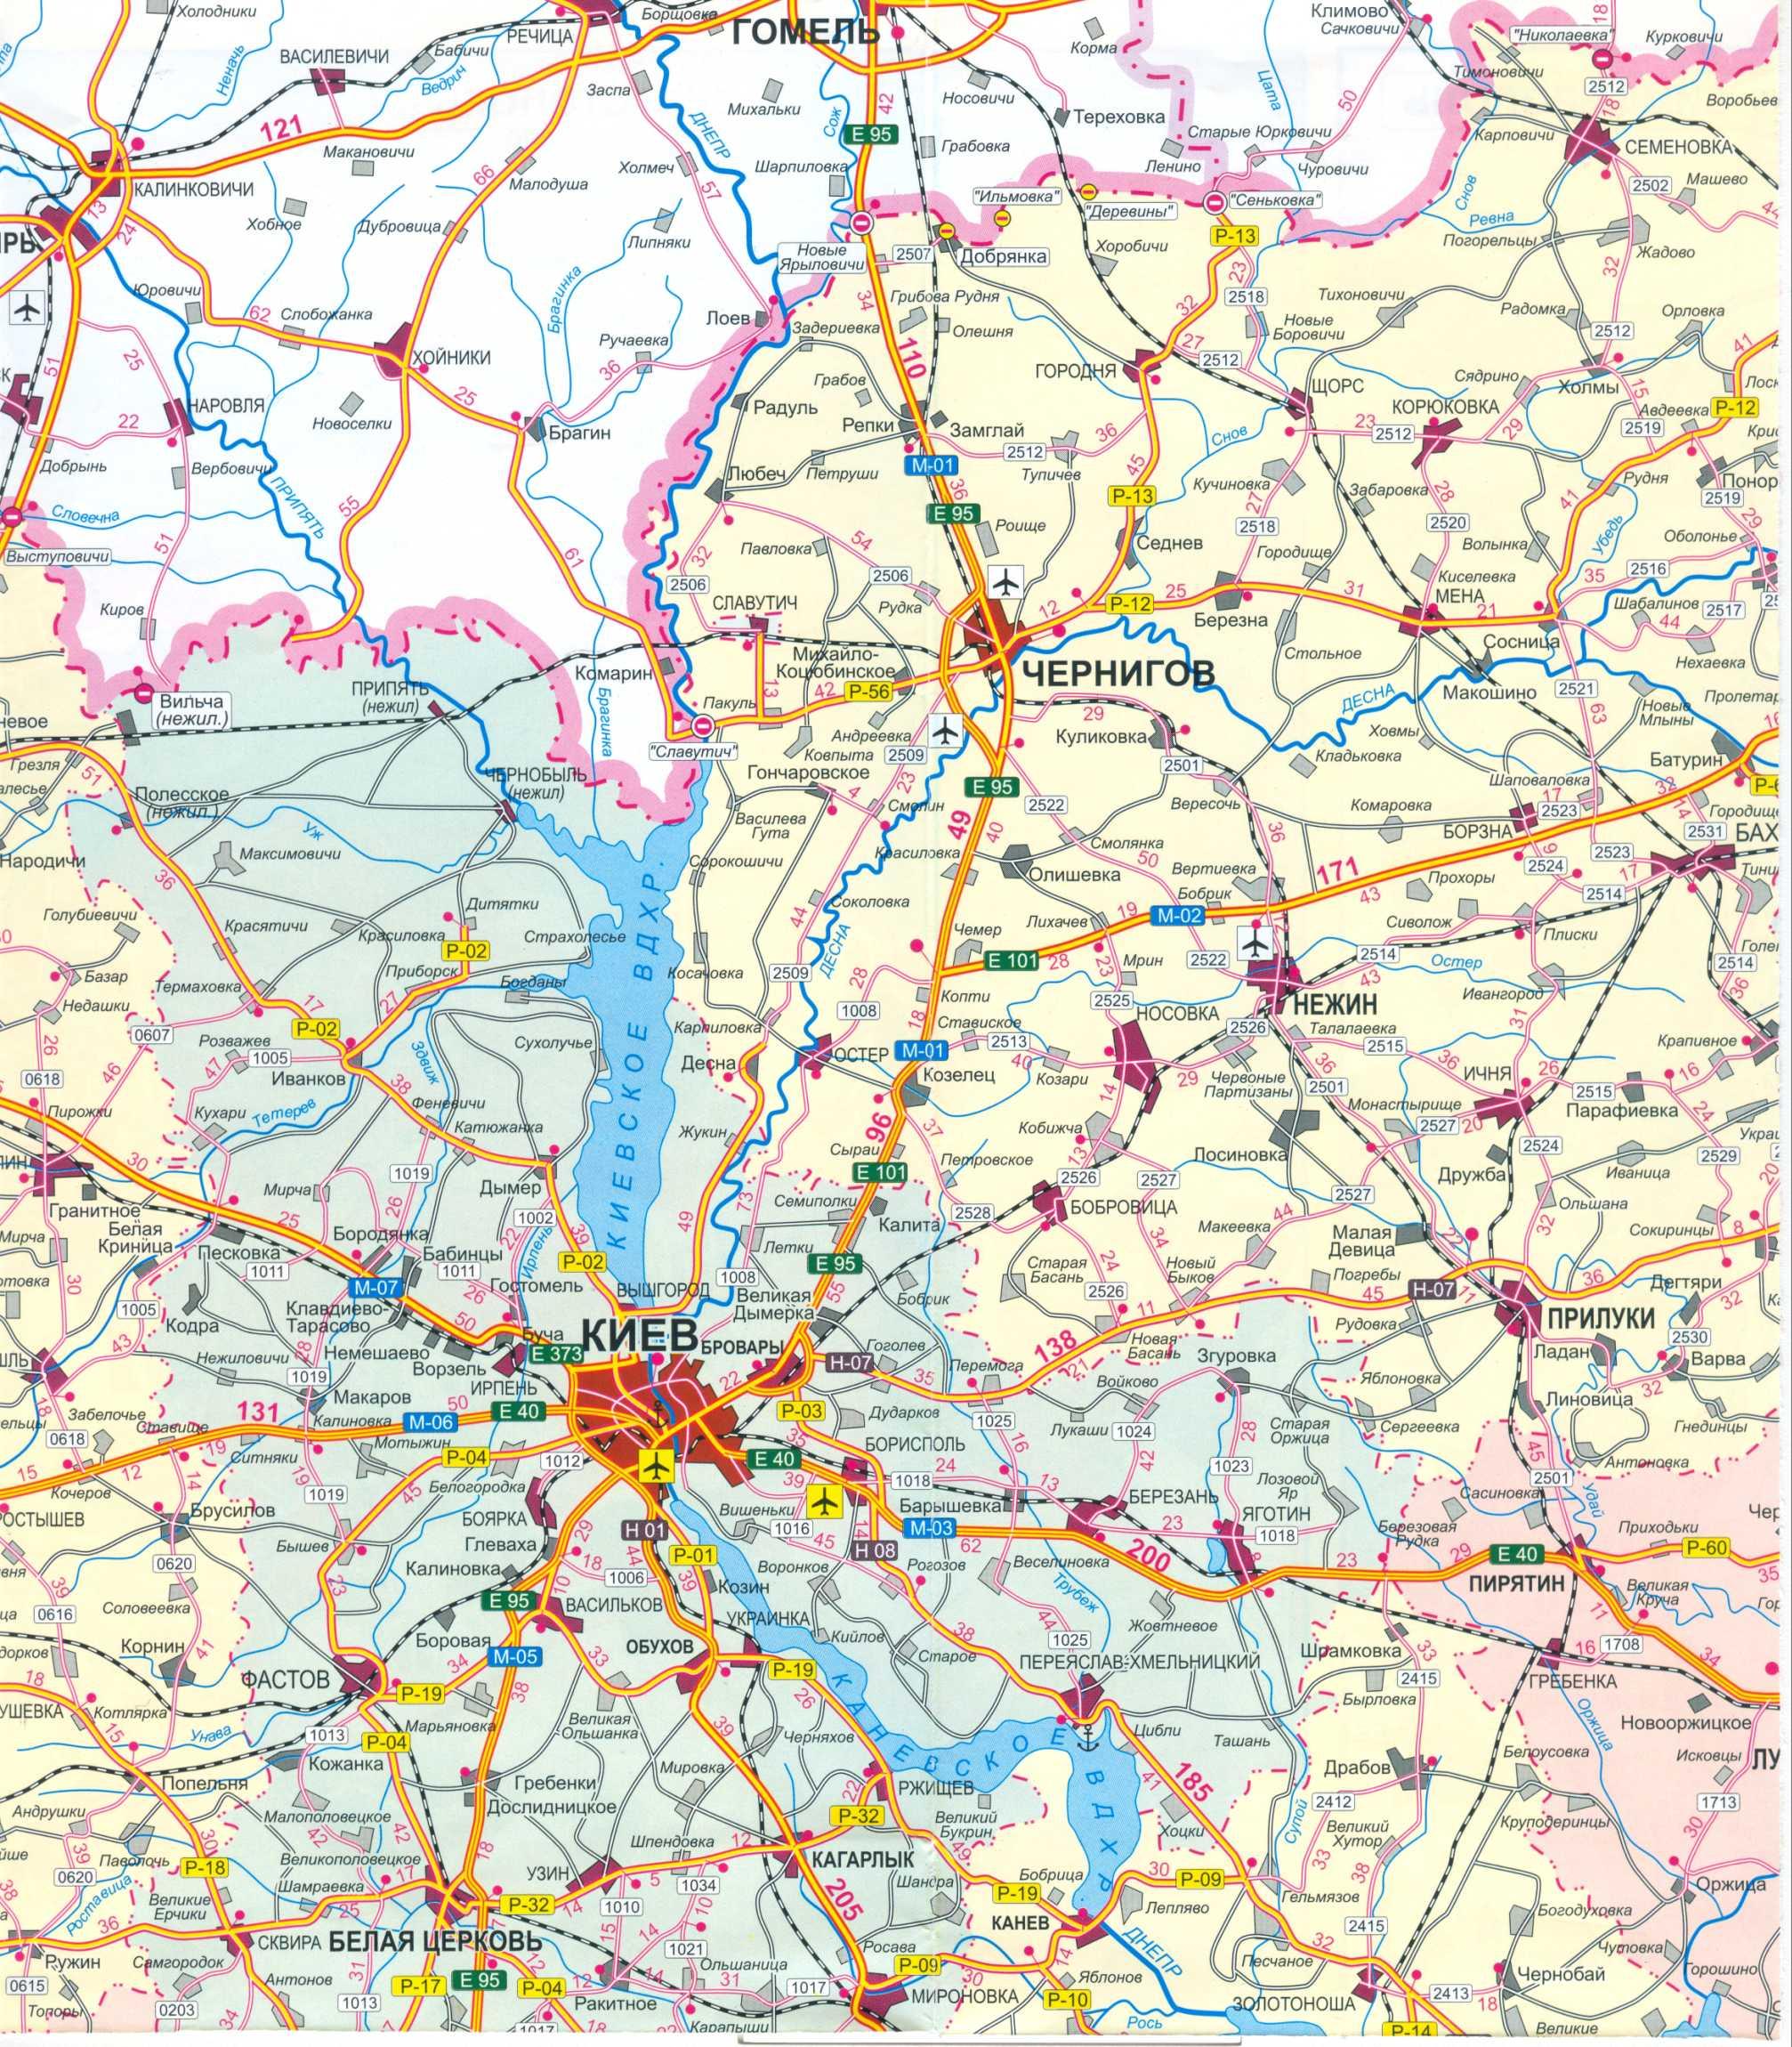 Karta Ukrainy Karta Kievskoj Oblasti Karta Ukrainy S Gorodami